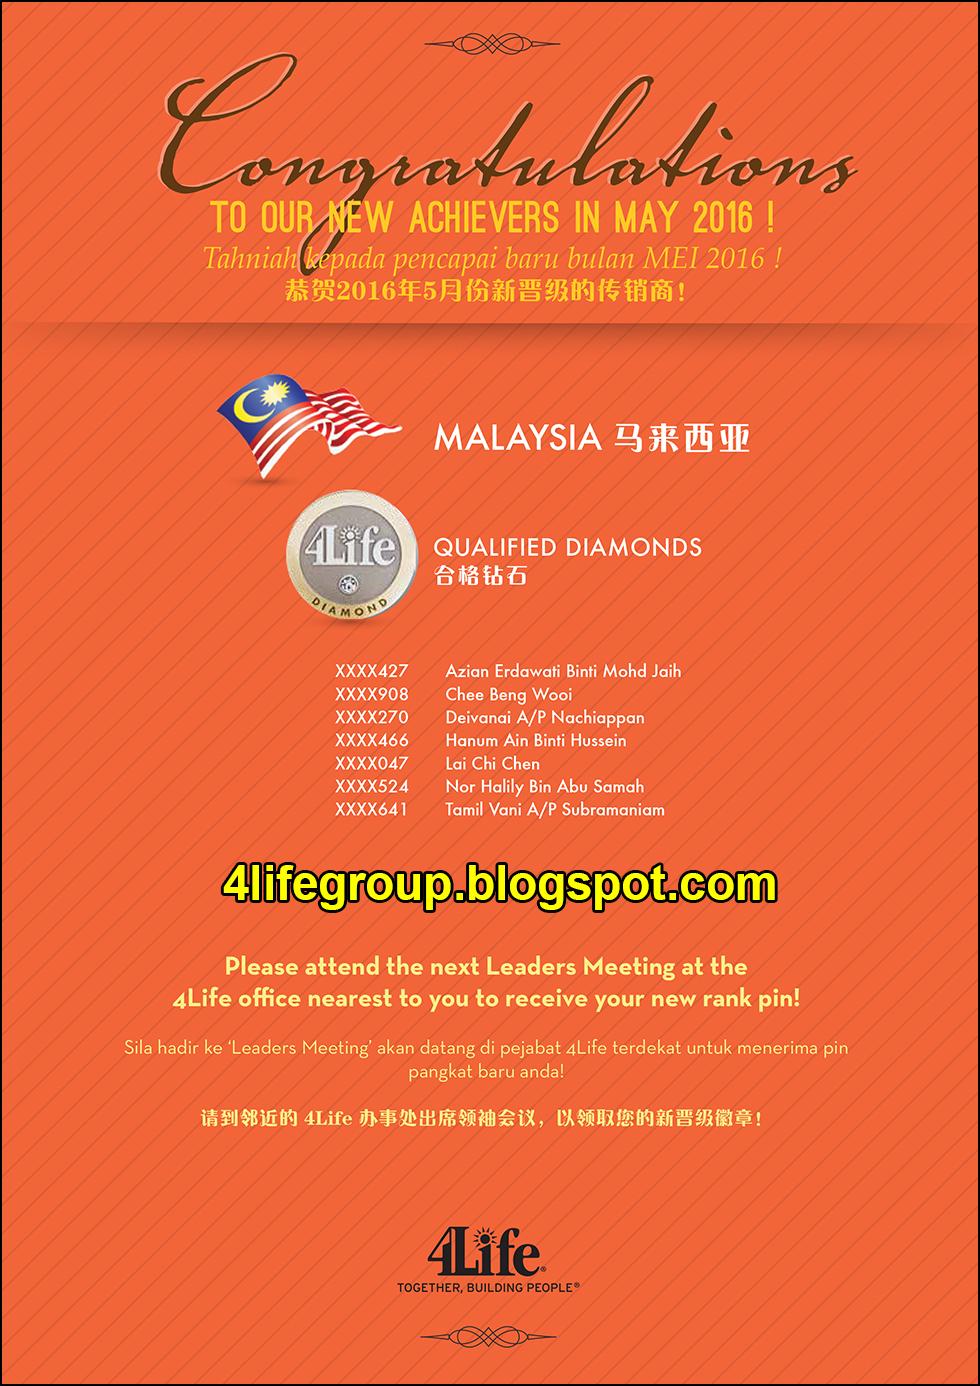 foto Pencapai Pangkat Baru Mei 2016 4Life Malaysia